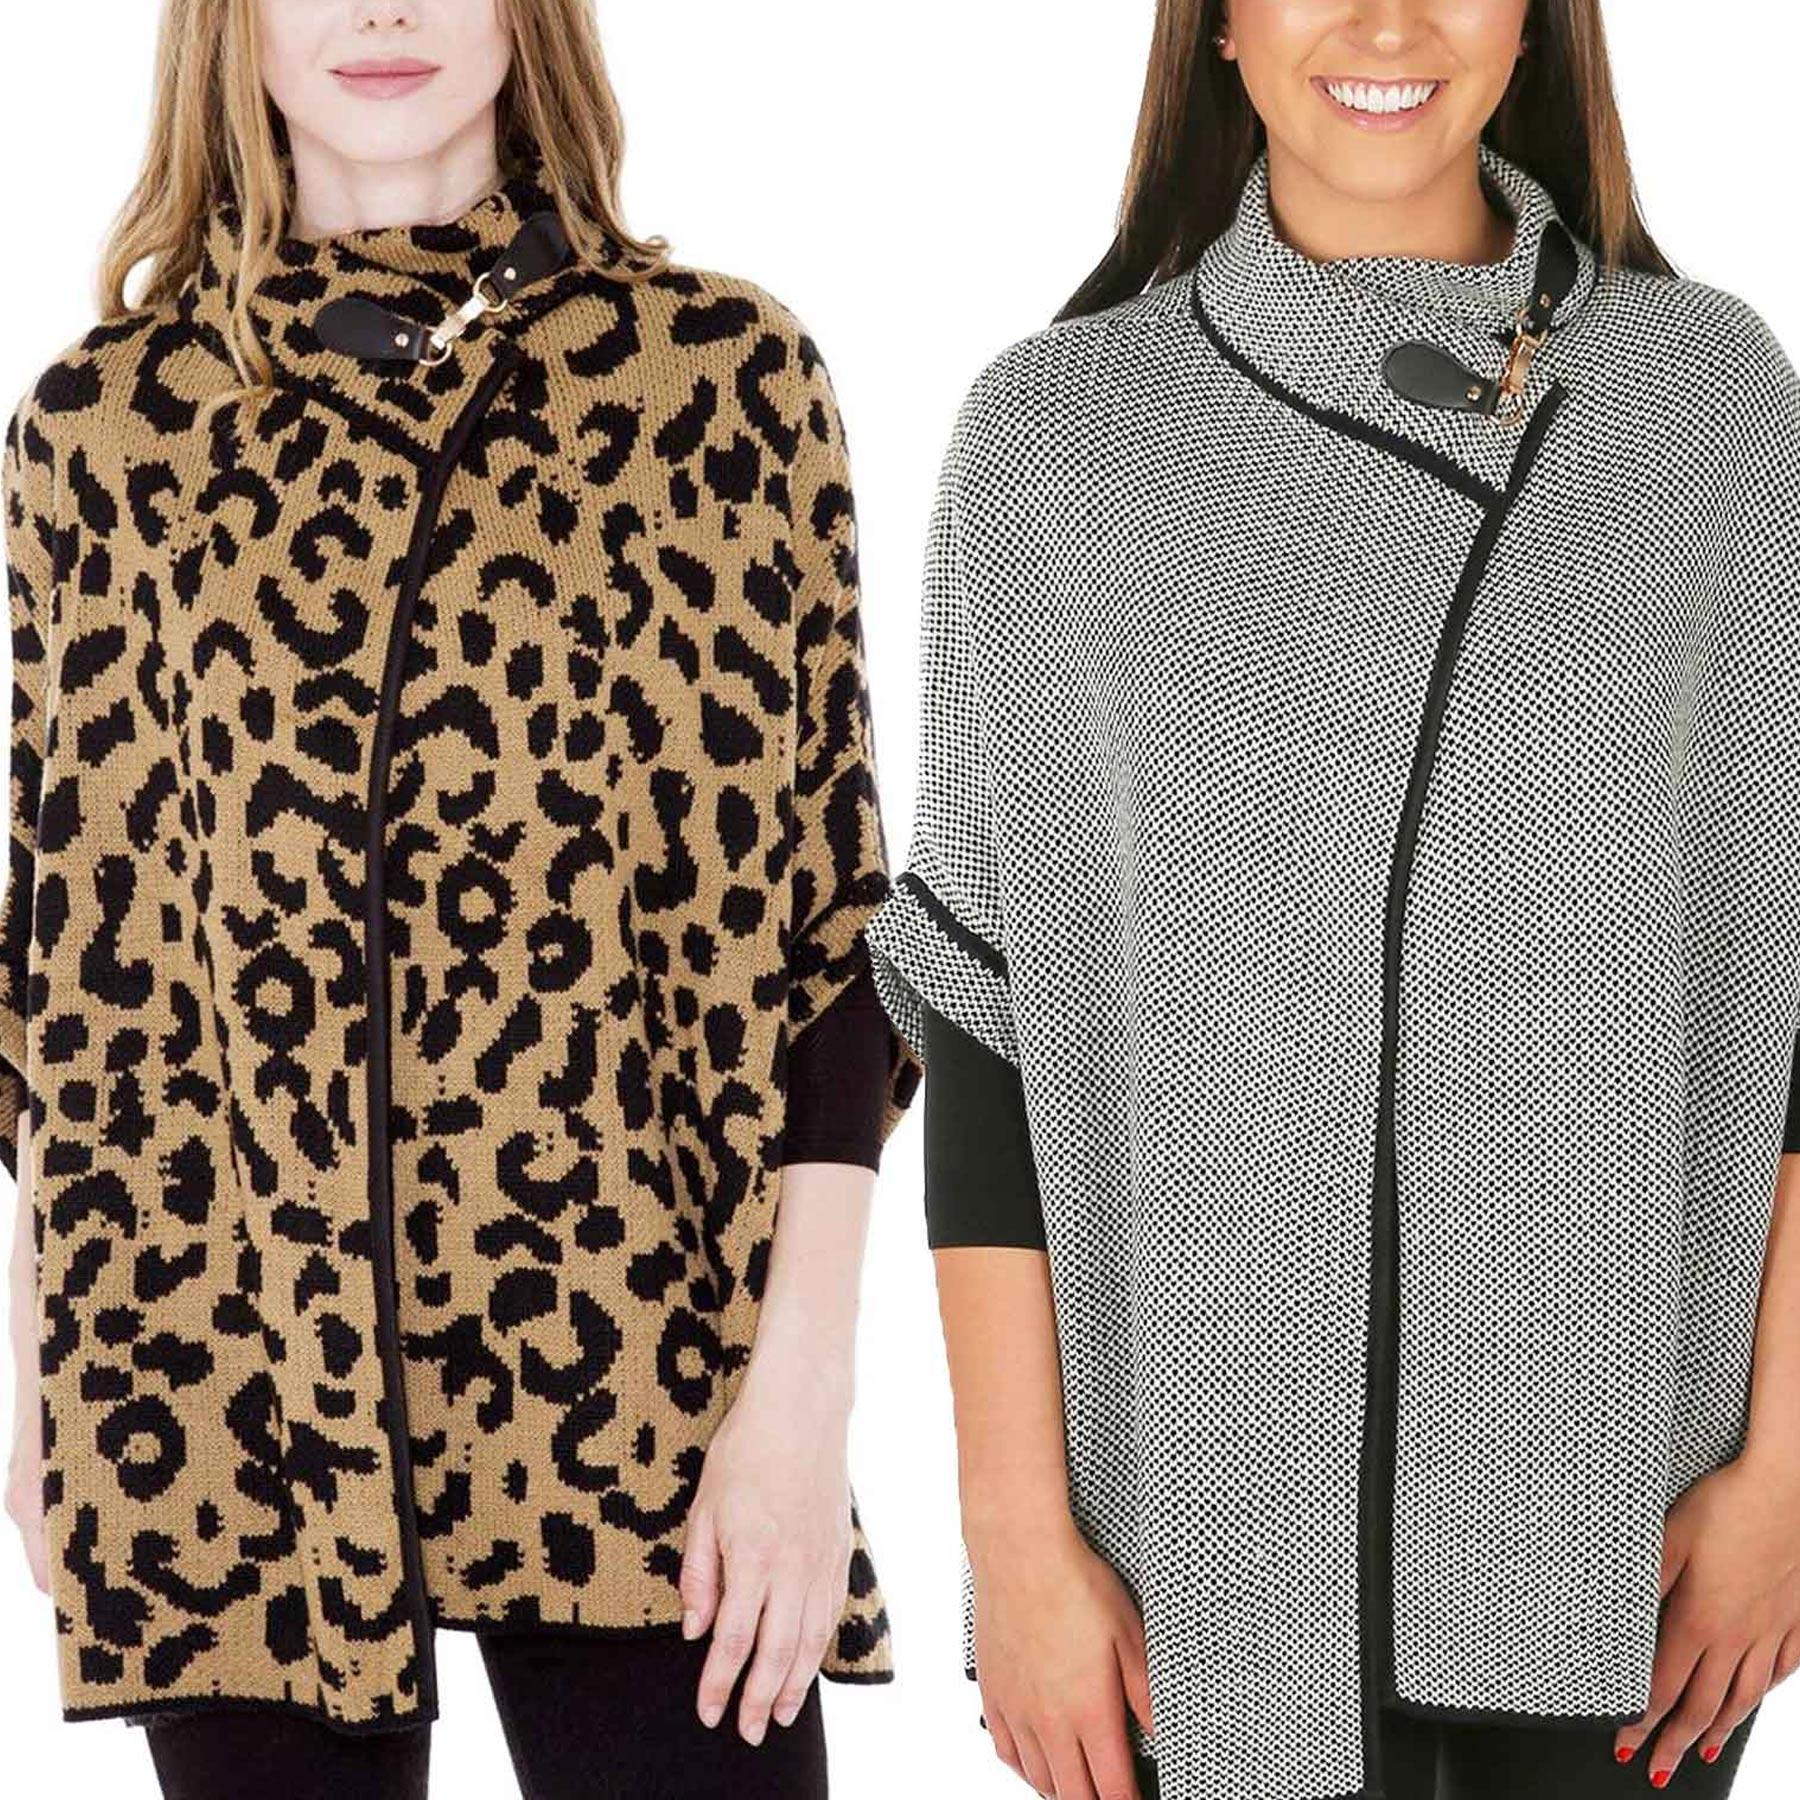 Knitted Cloak - JP511, JP992, & JP1493